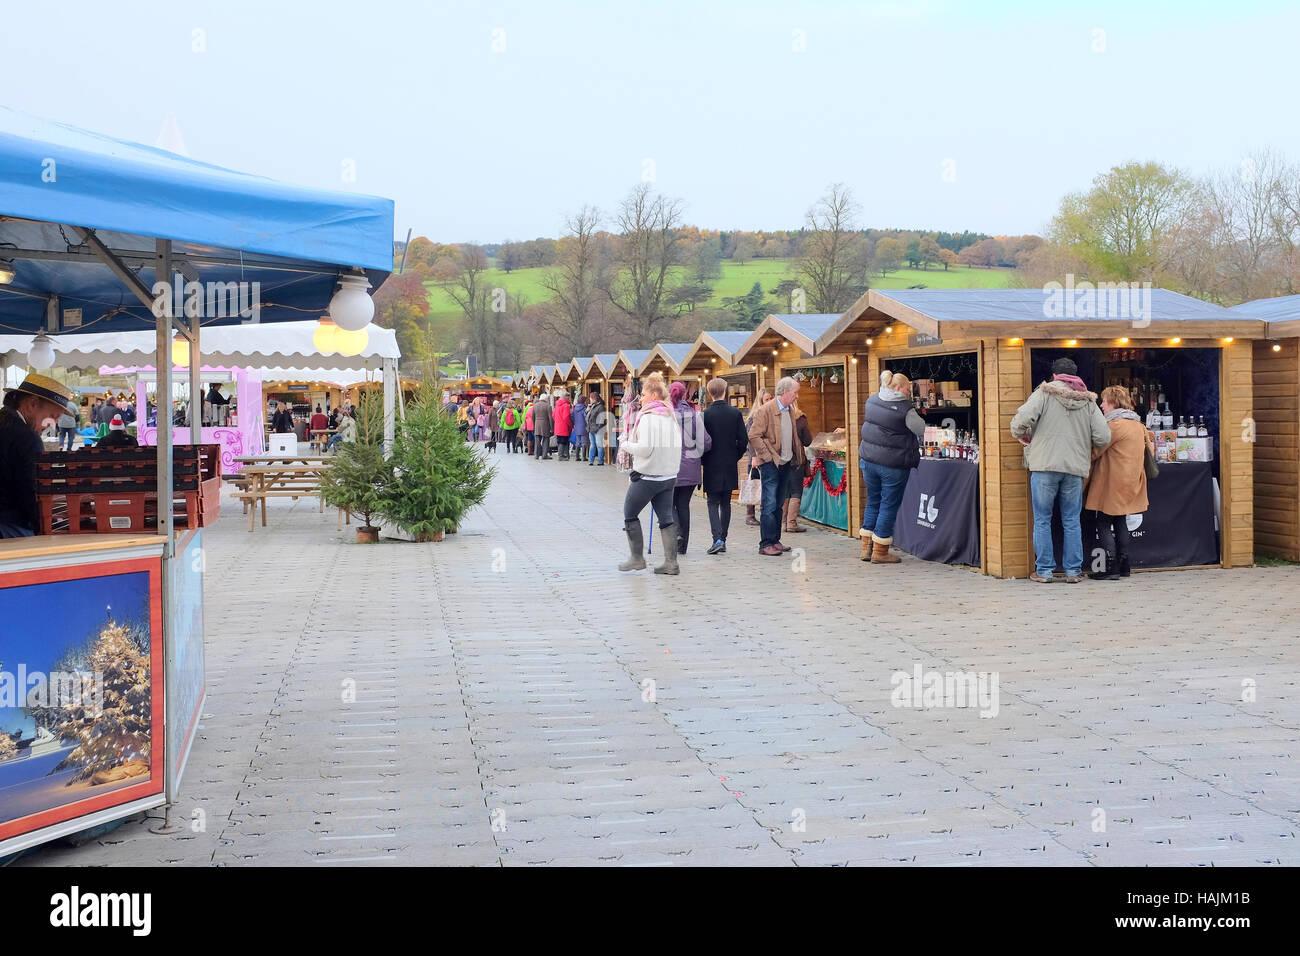 Chatsworth, Derbyshire, UK. November 15, 2016. Wooden Christmas market  stalls in